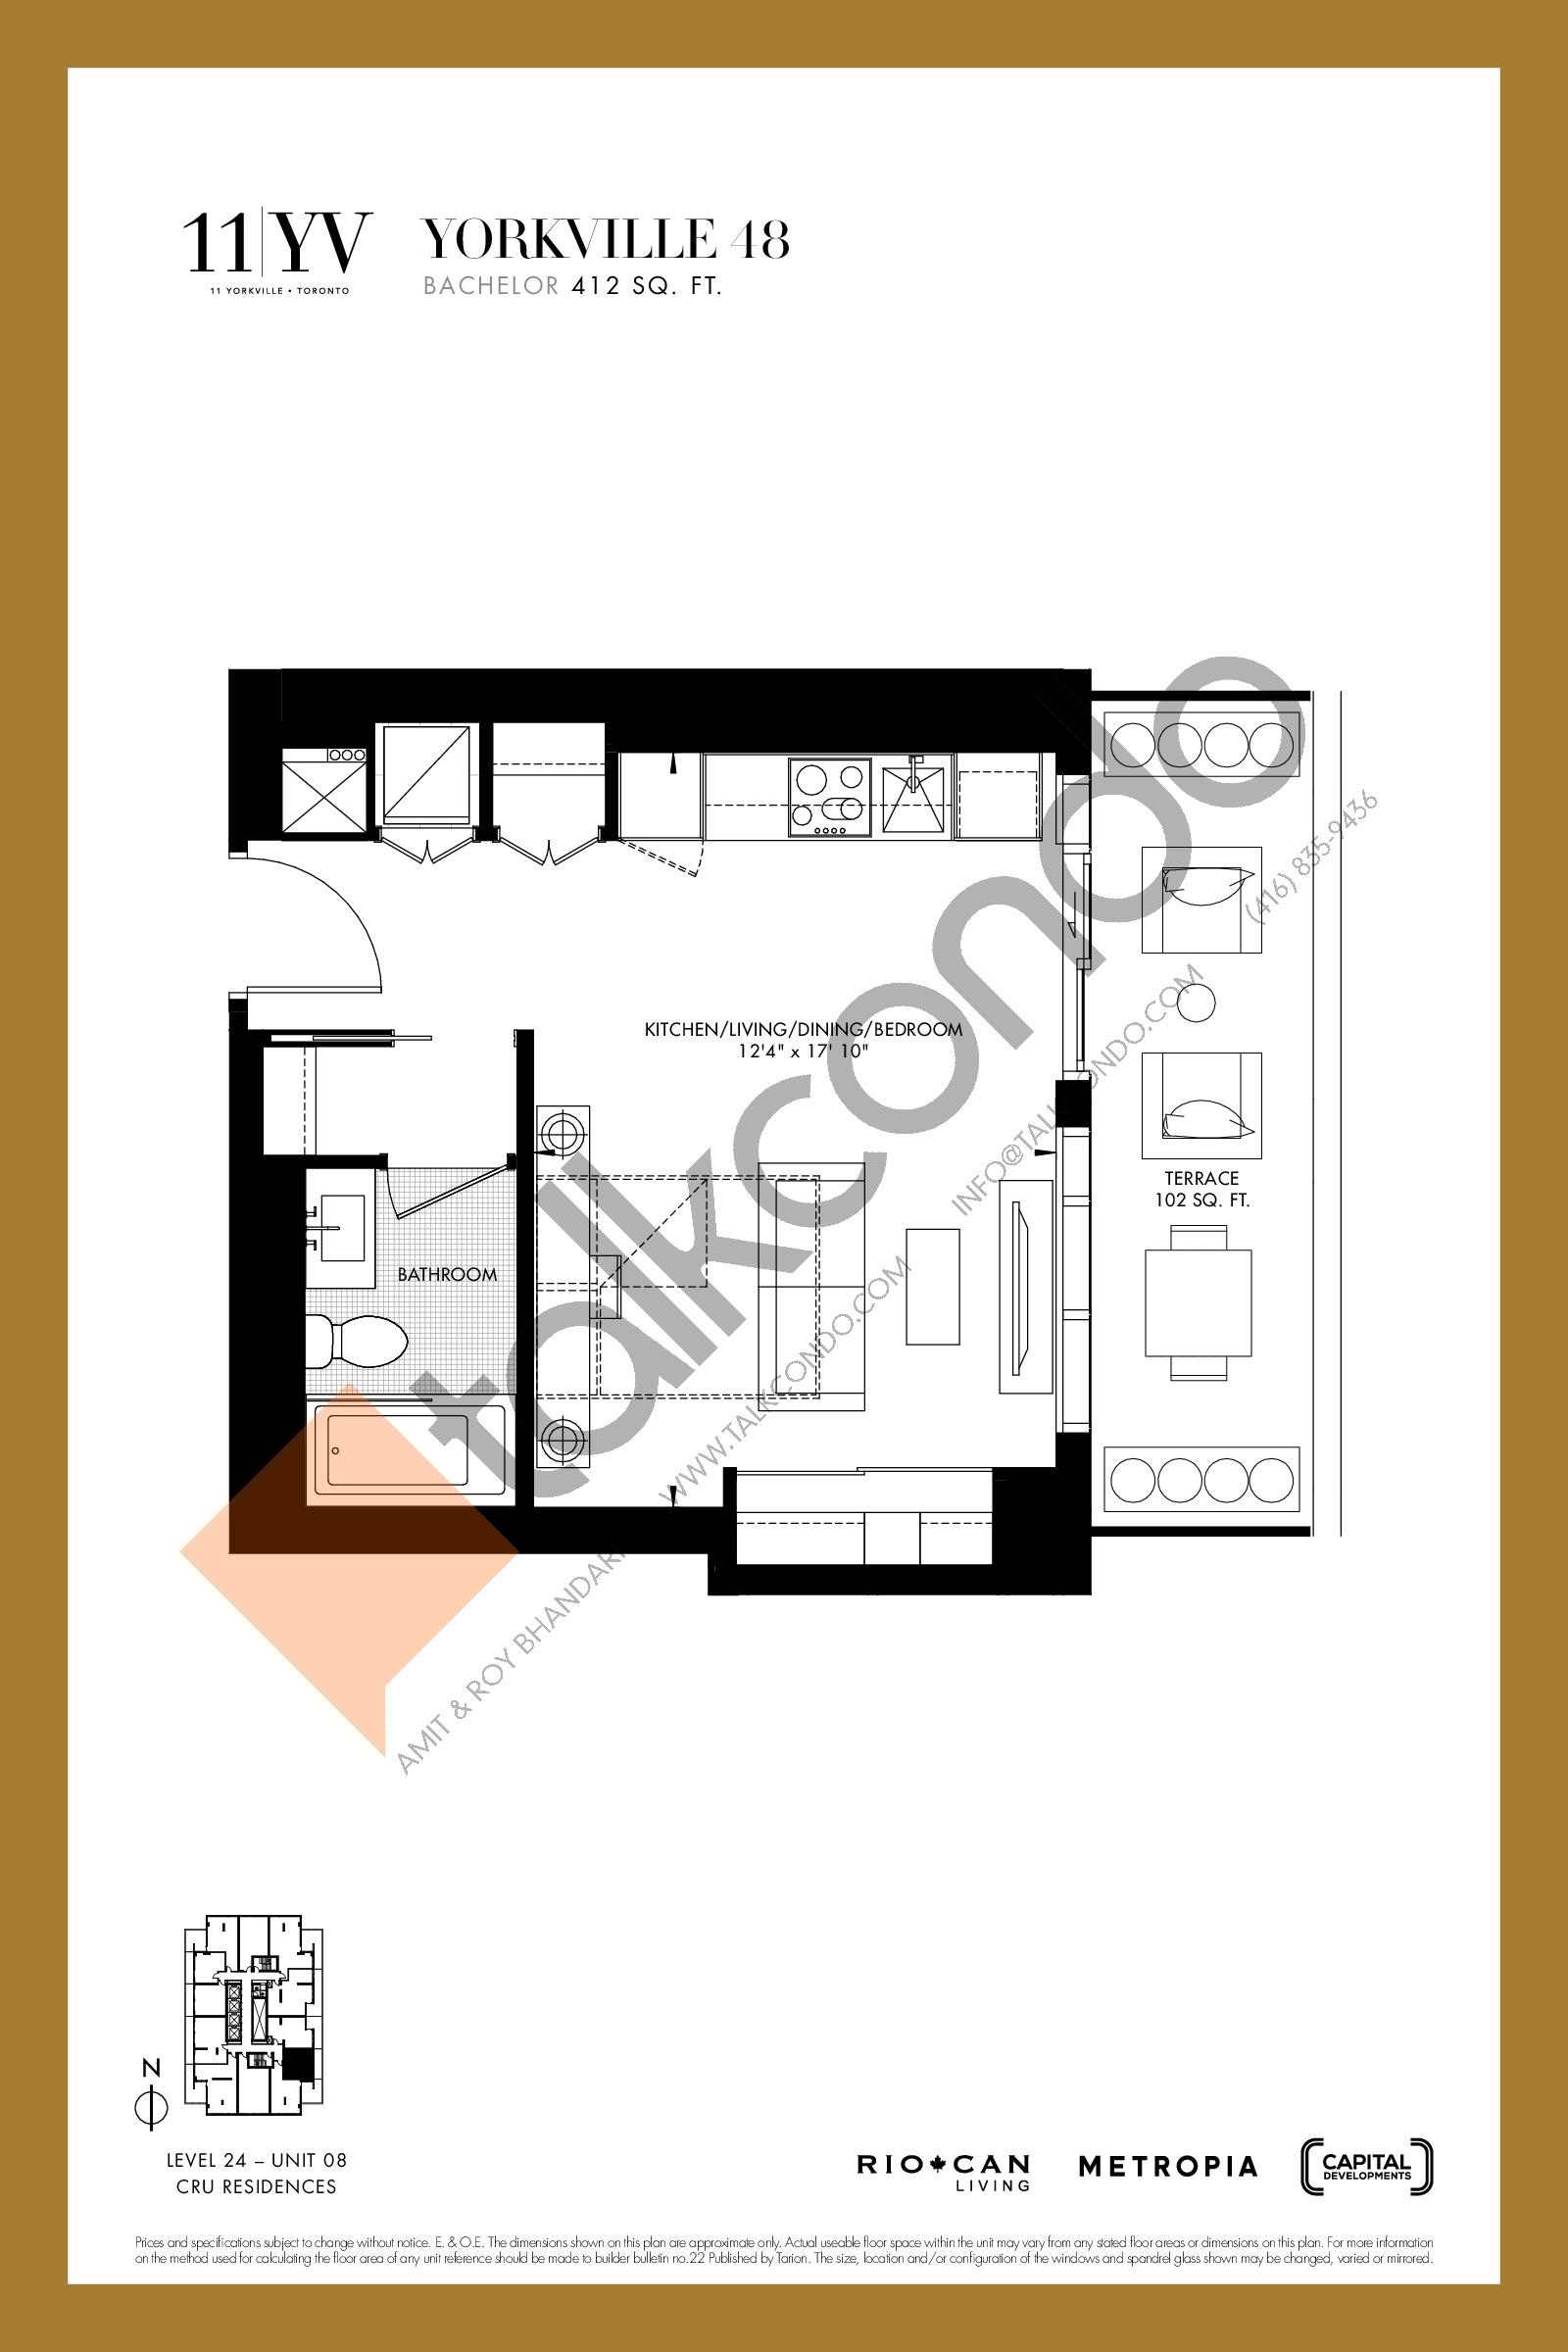 Yorkville 48 Floor Plan at 11YV Condos - 412 sq.ft